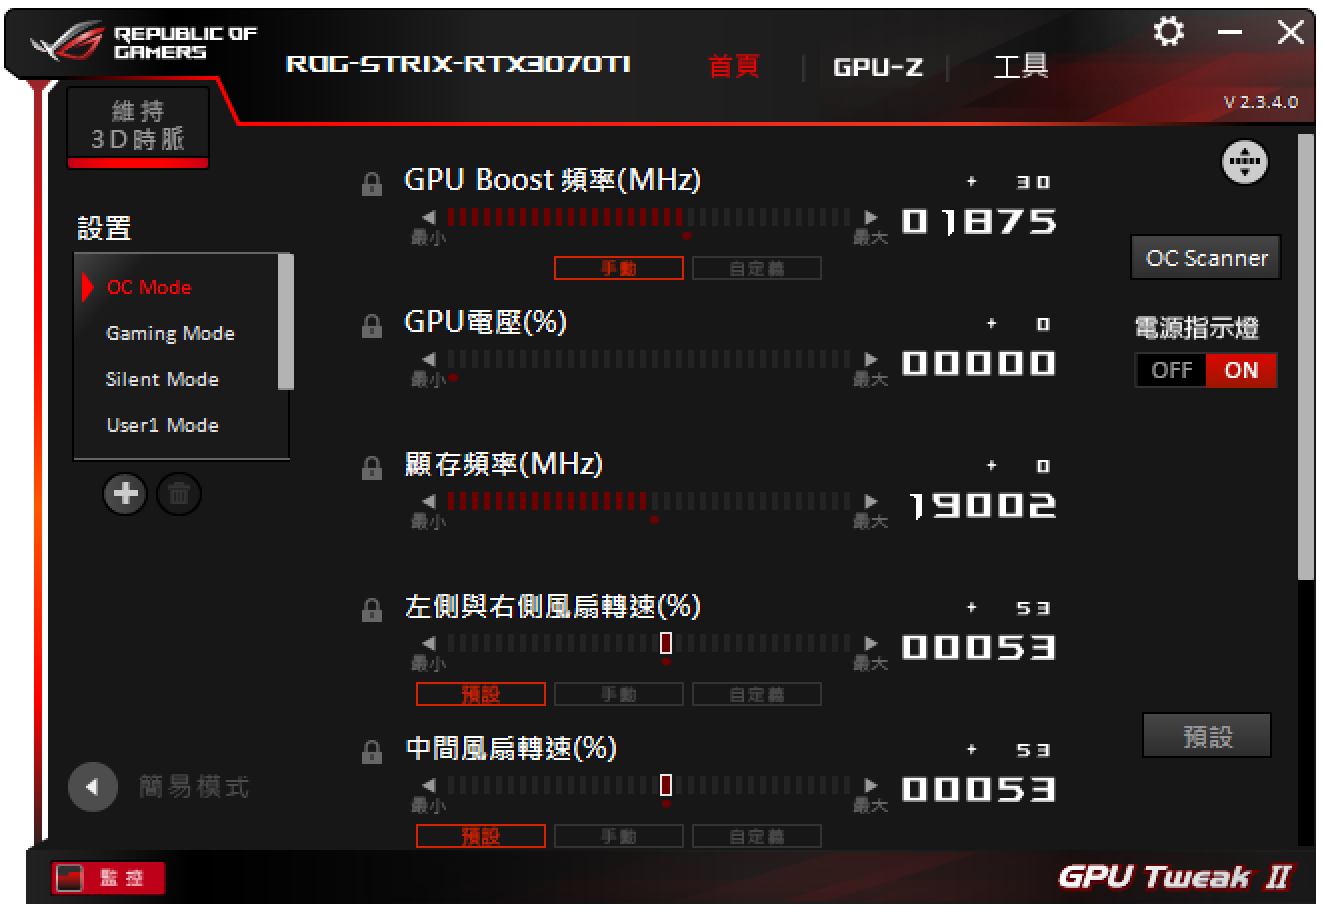 ASUS ROG STRIX RTX 3070 Ti O8G